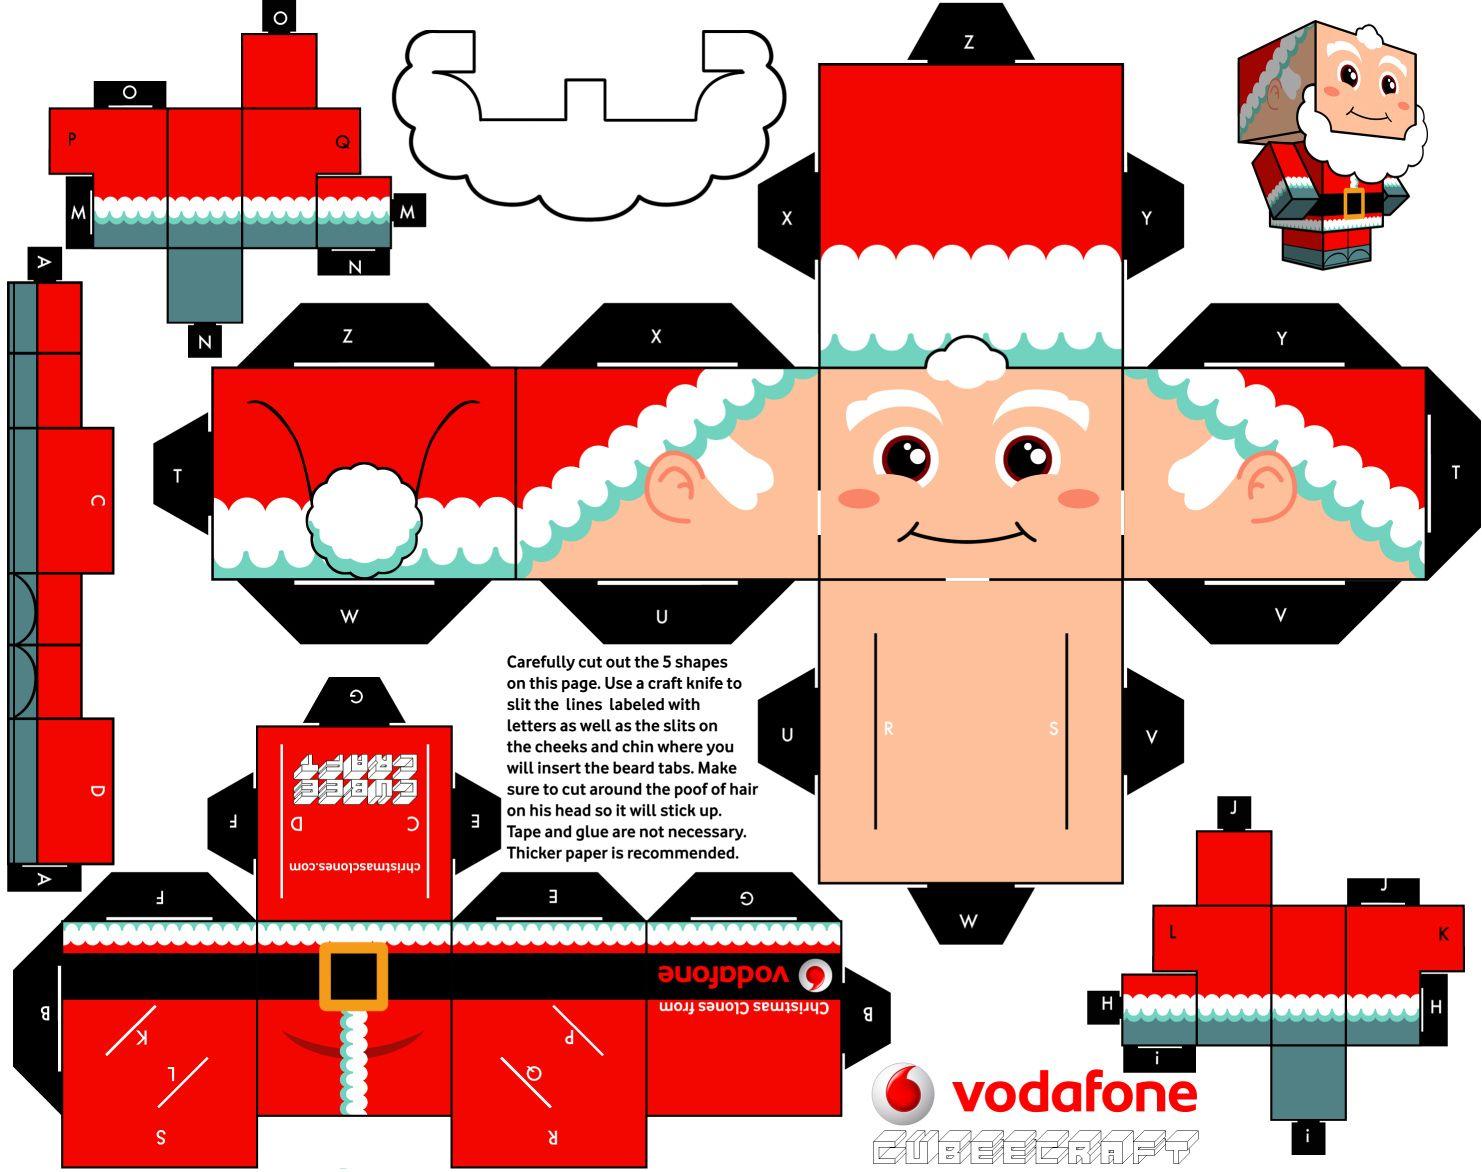 Vodafone toys images  The Christmas Clones de Cubeecraft  Pinterest  Paper toys Noel